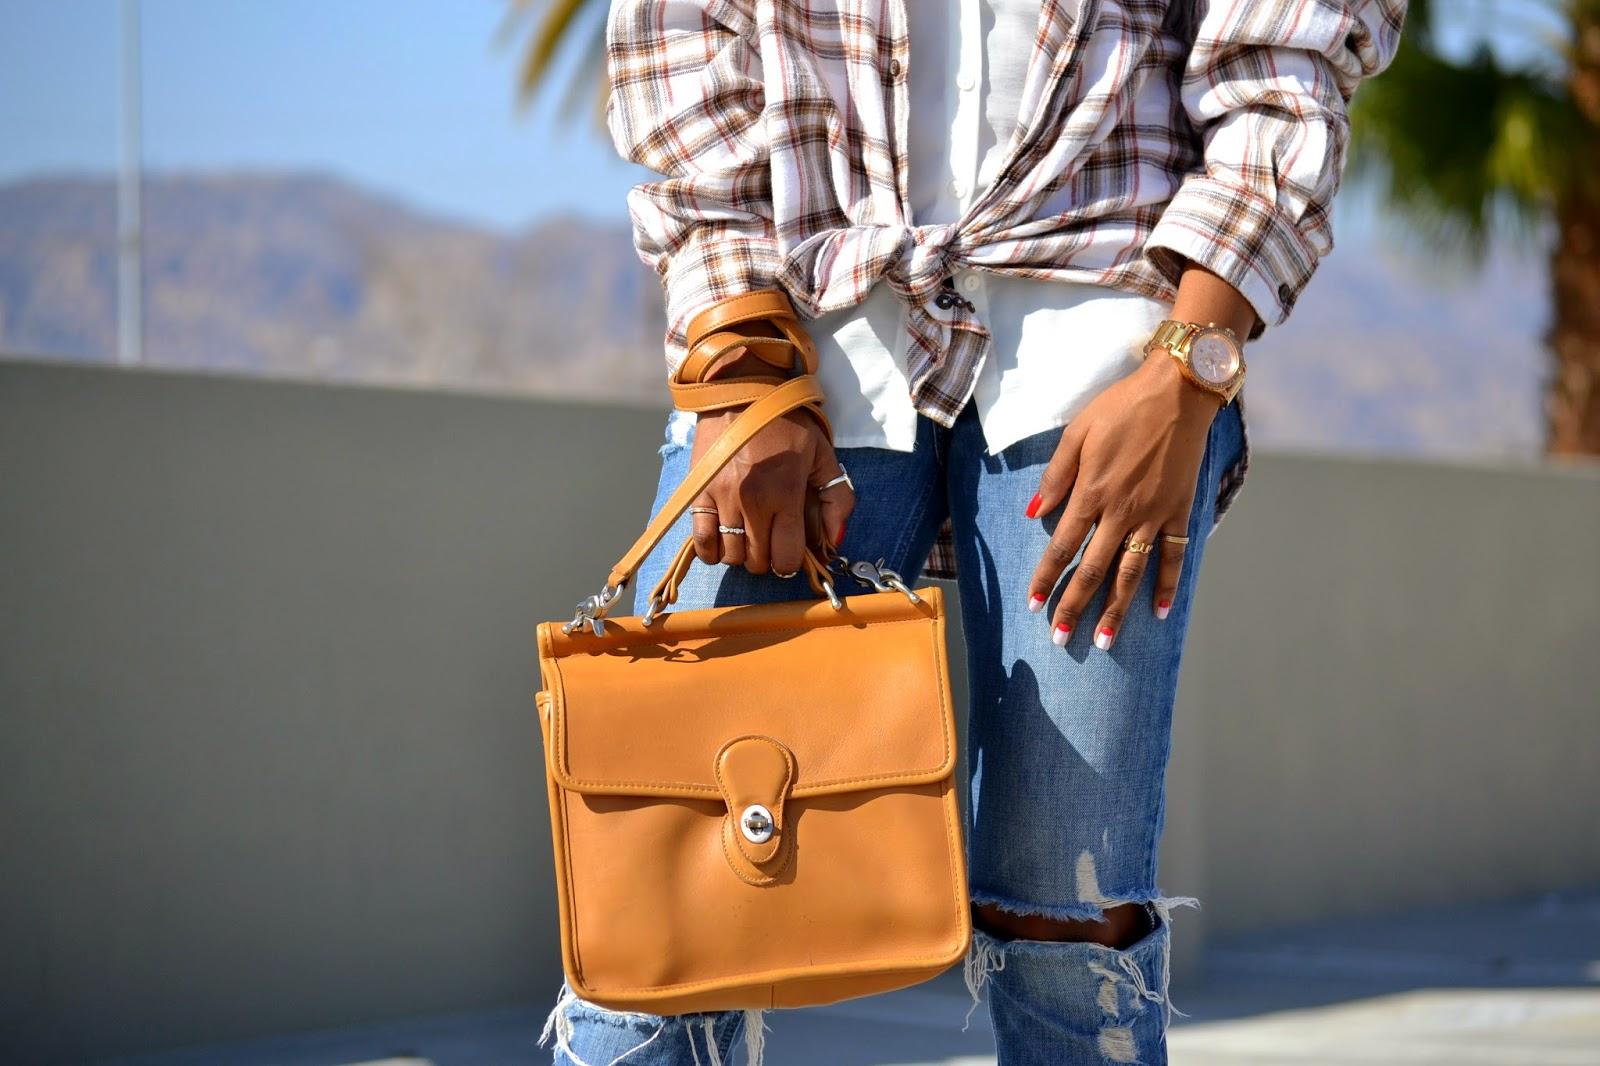 Wearing Coach Willis bag with rose gold Nixon watch